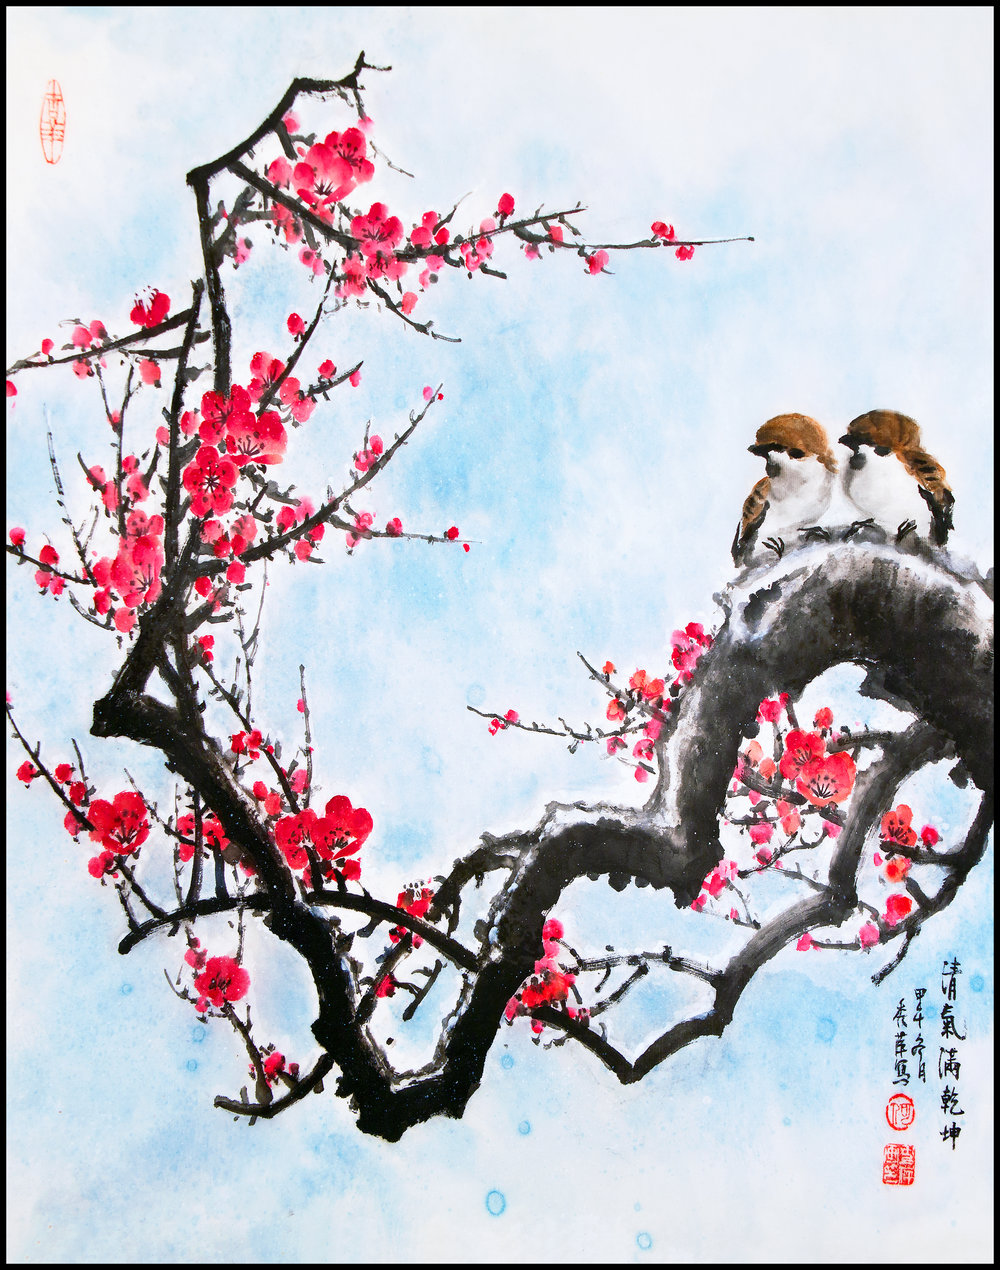 MHo_Plum Blossom.jpg